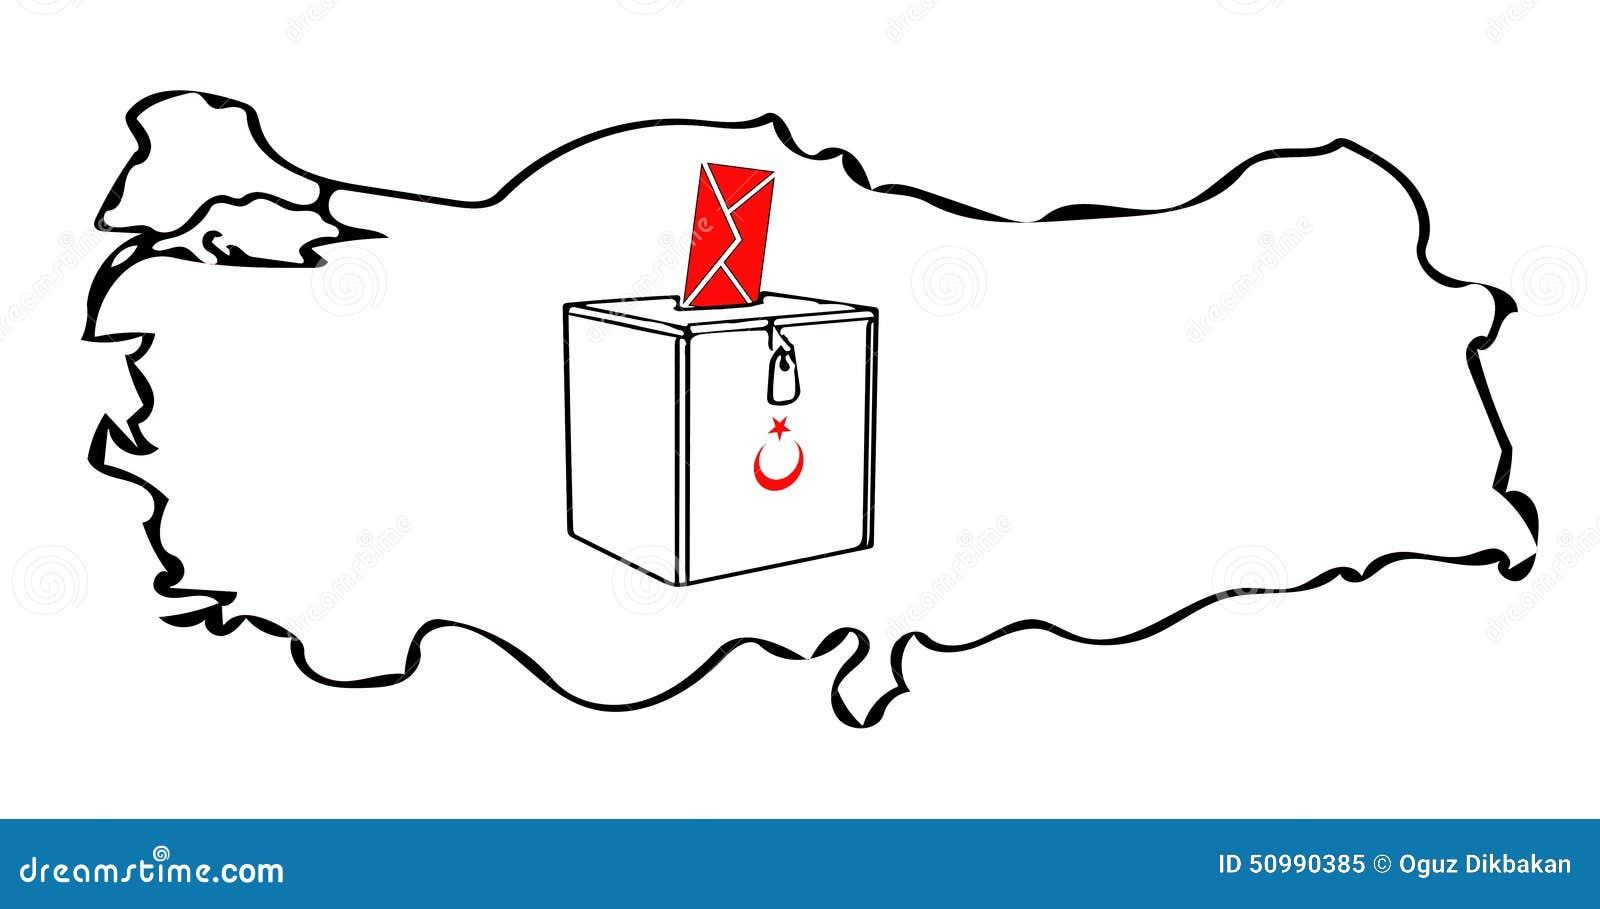 эскиз конверта: